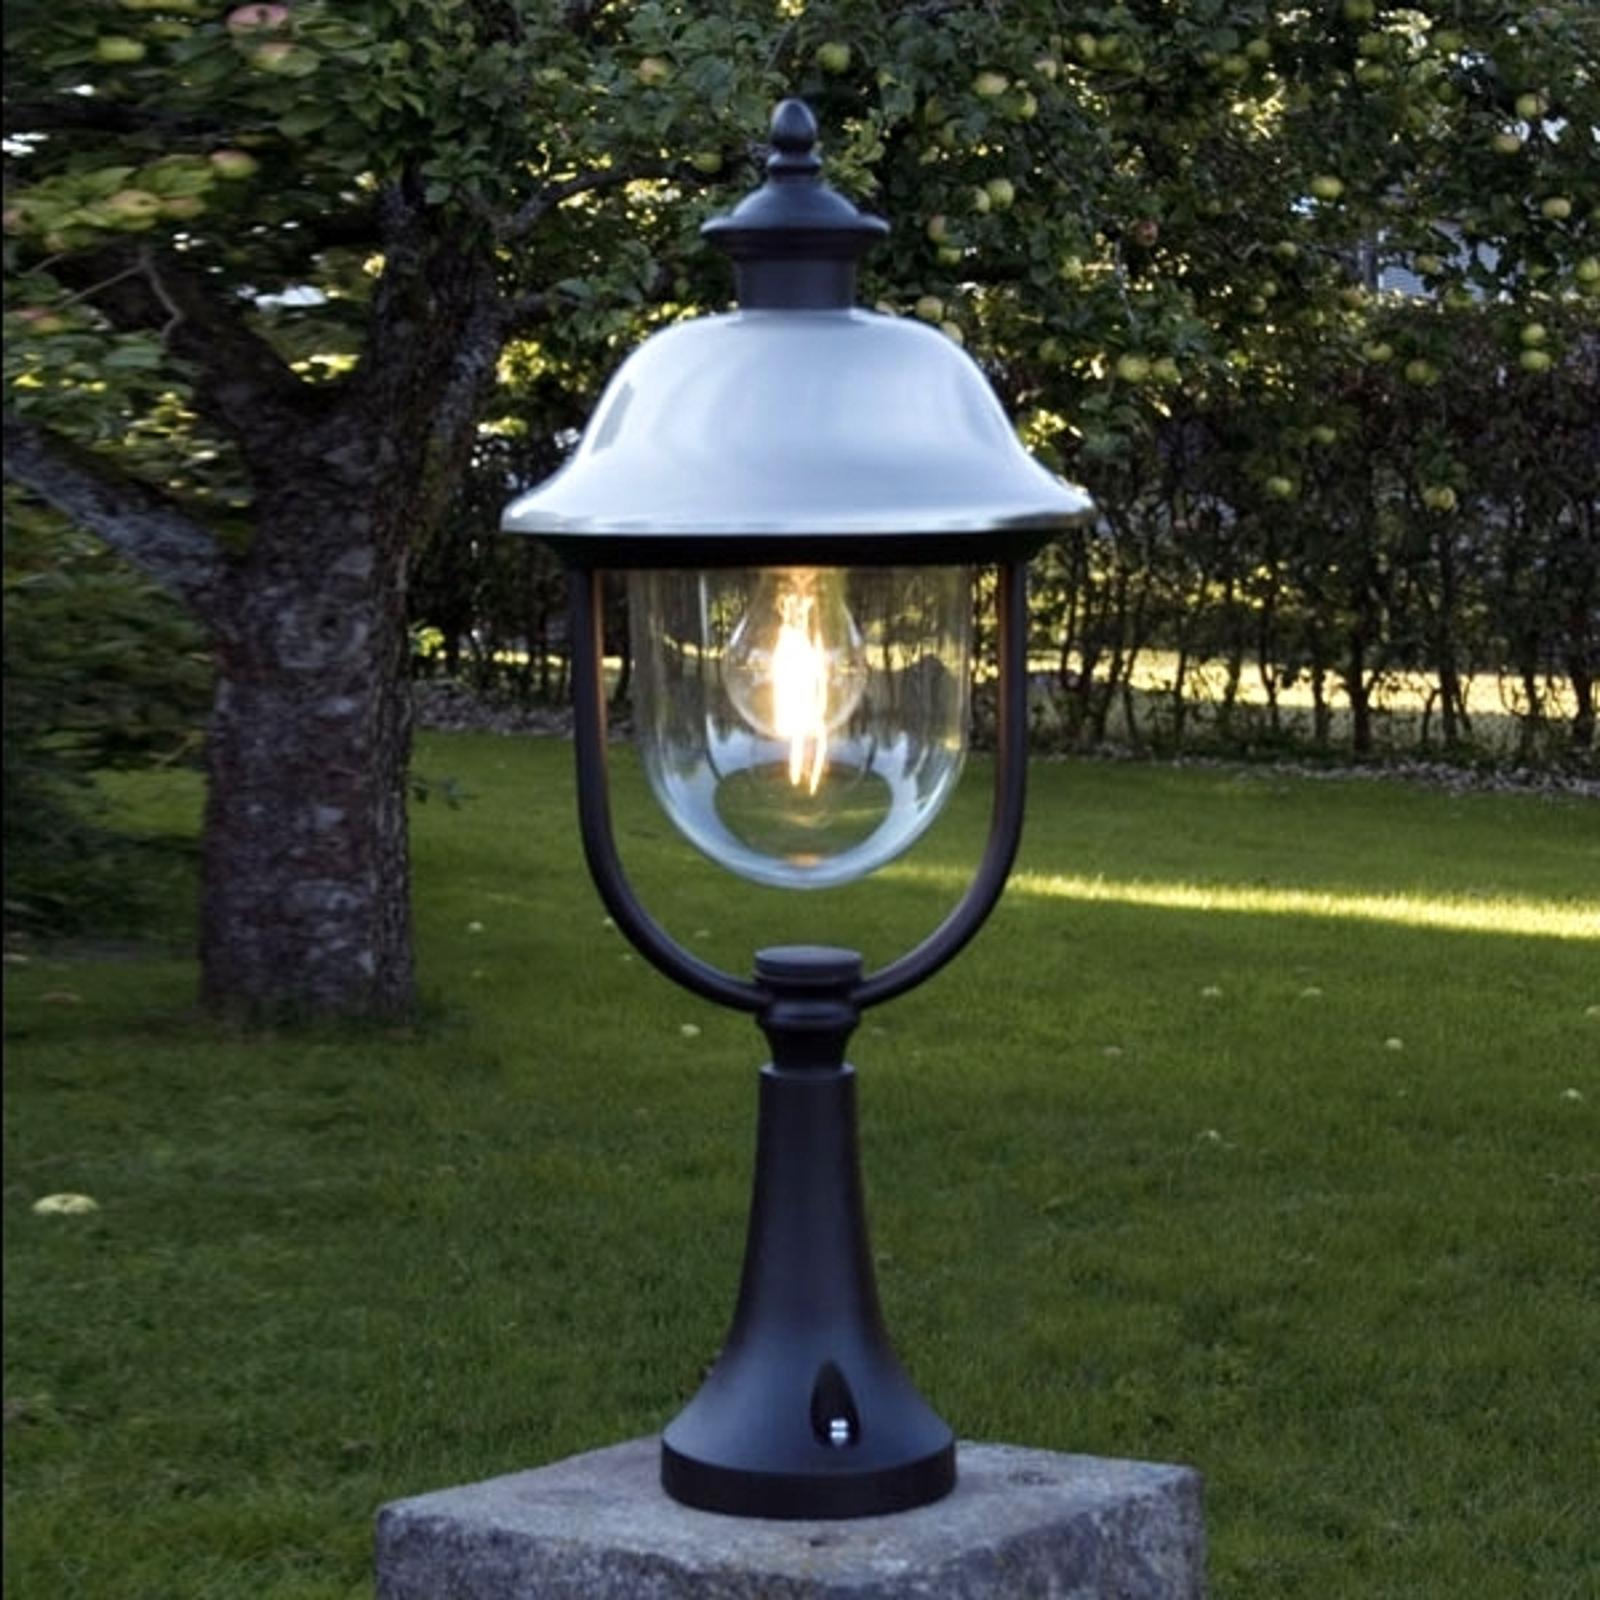 Intramontabile lampada con piedistallo PARMA